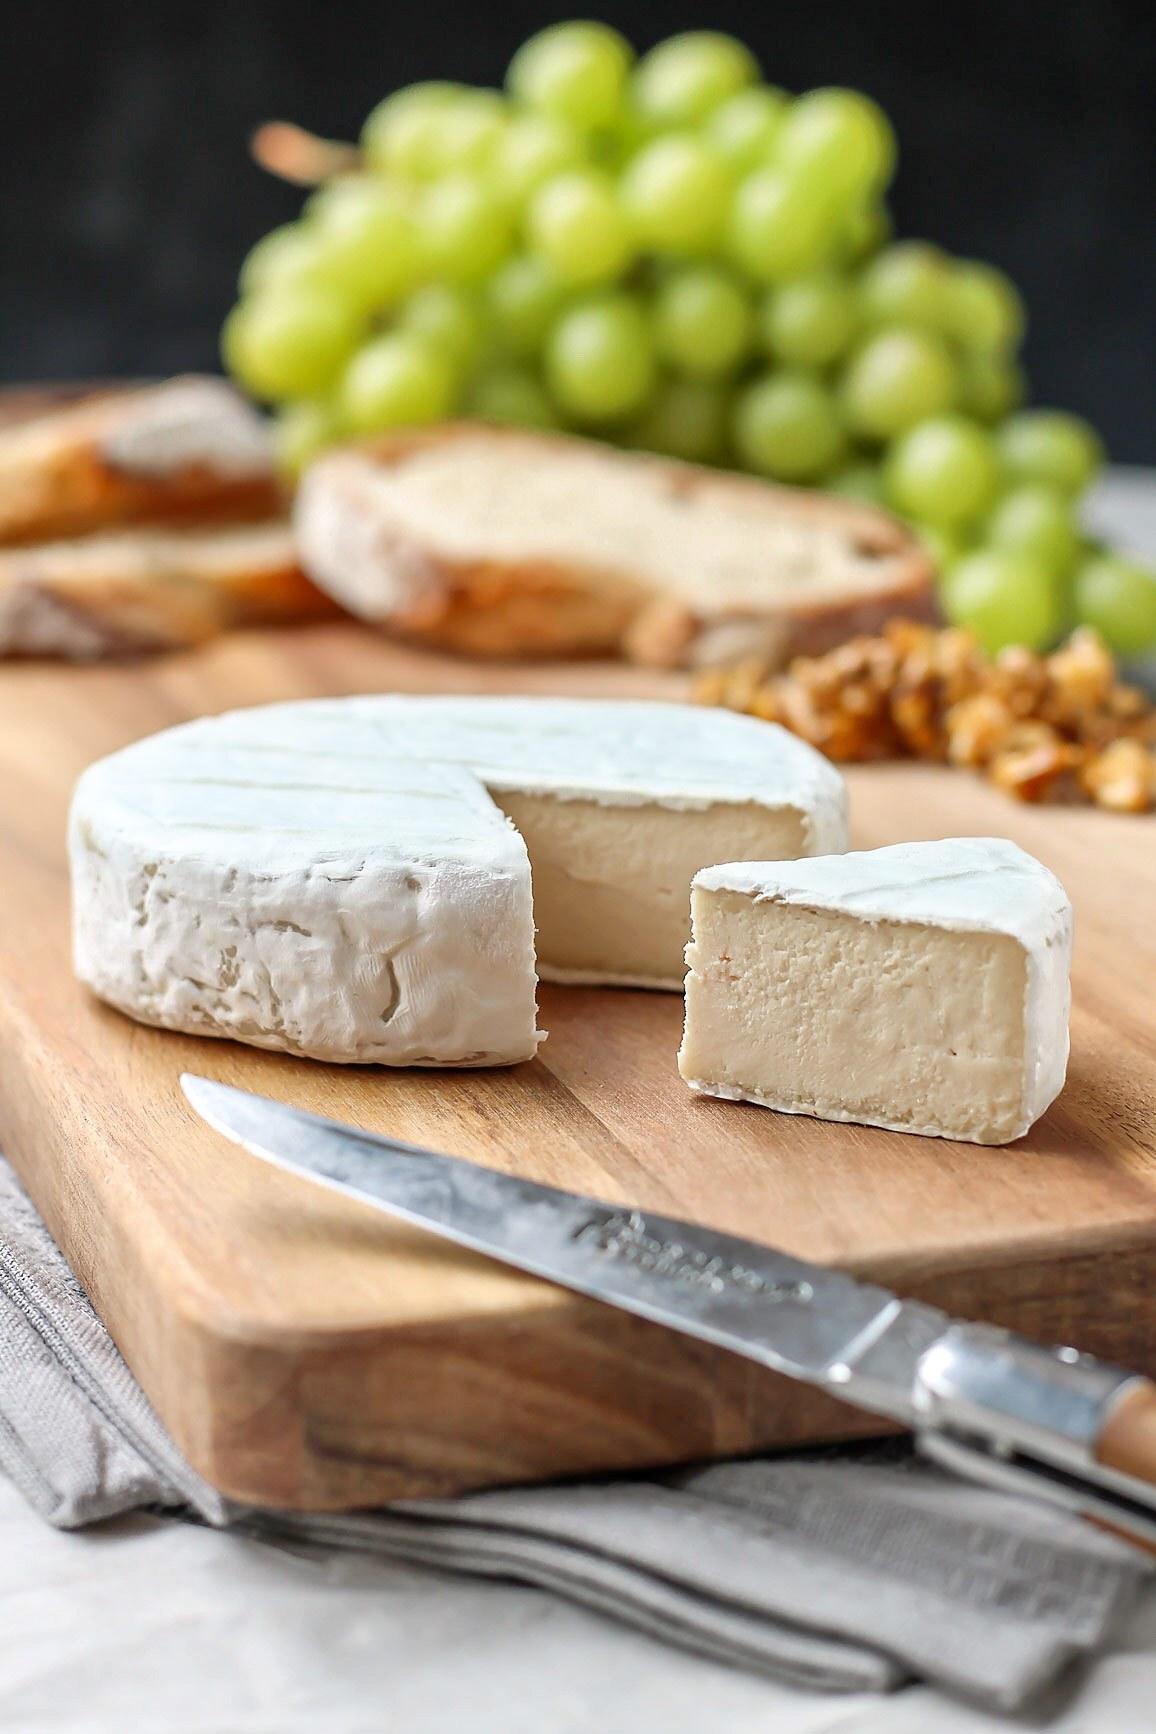 Vegan Aged Camembert Cheese - Full of Plants